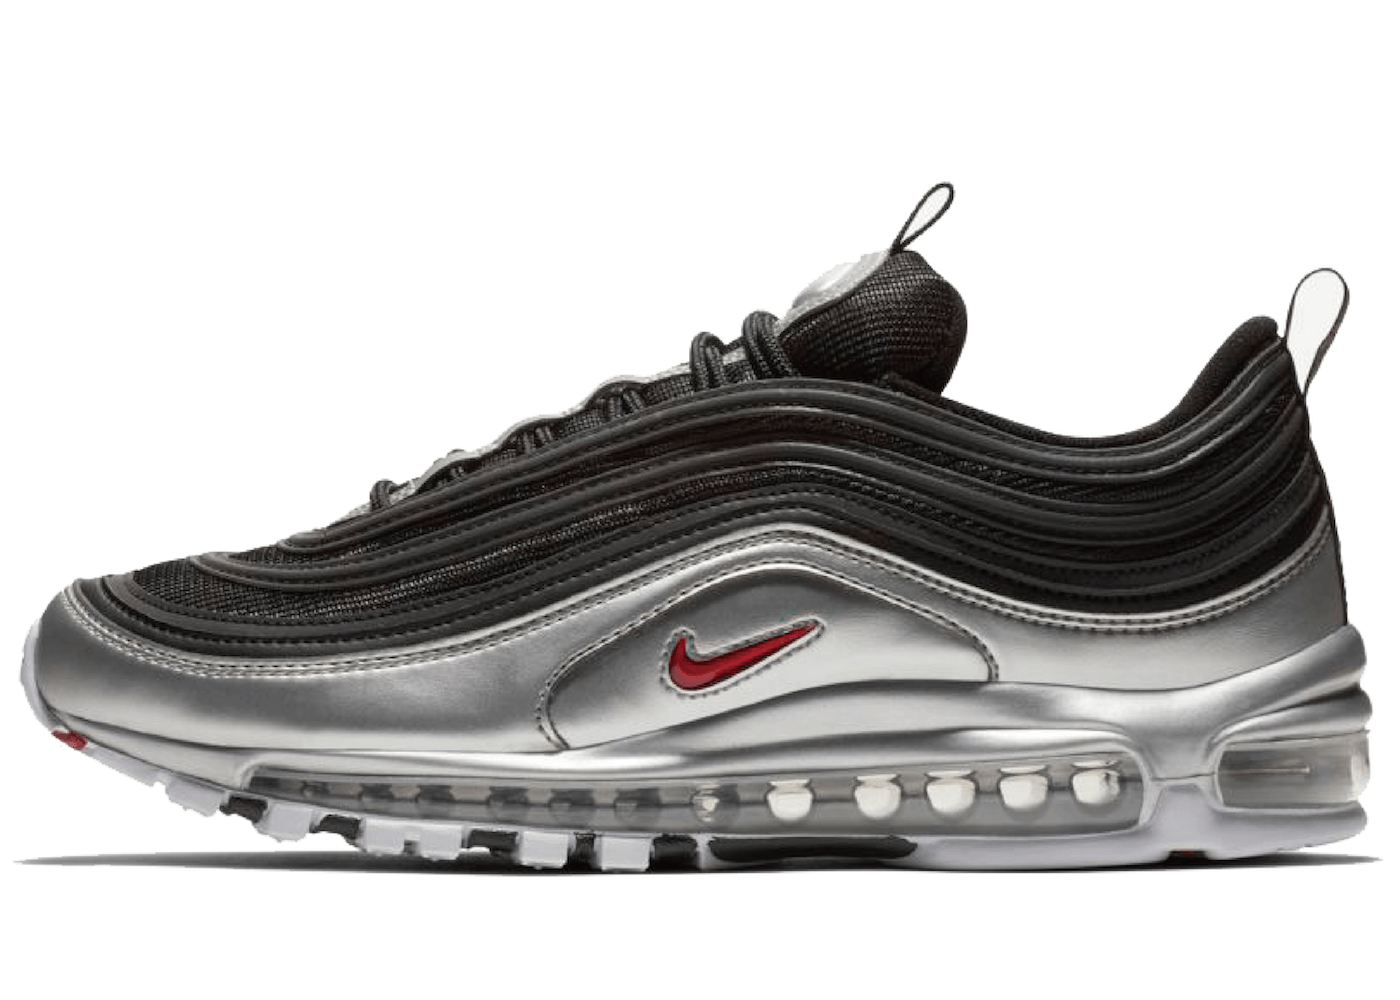 Nike Air Max 97 Black and Silverの写真